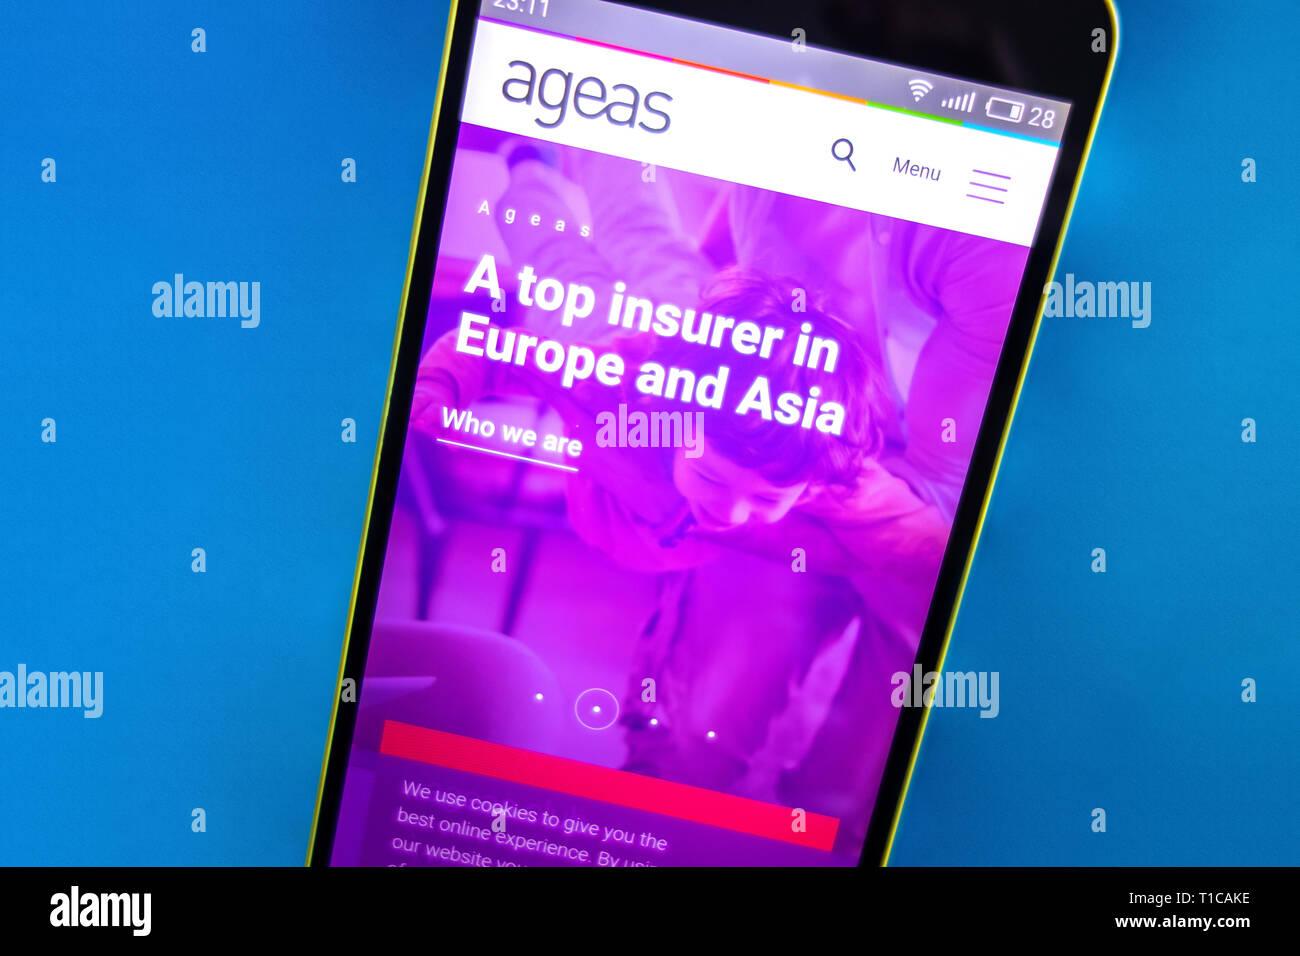 Berdyansk, Ukraine - March 23, 2019: Illustrative Editorial, Ageas website homepage. Ageas logo visible on the phone screen. - Stock Image